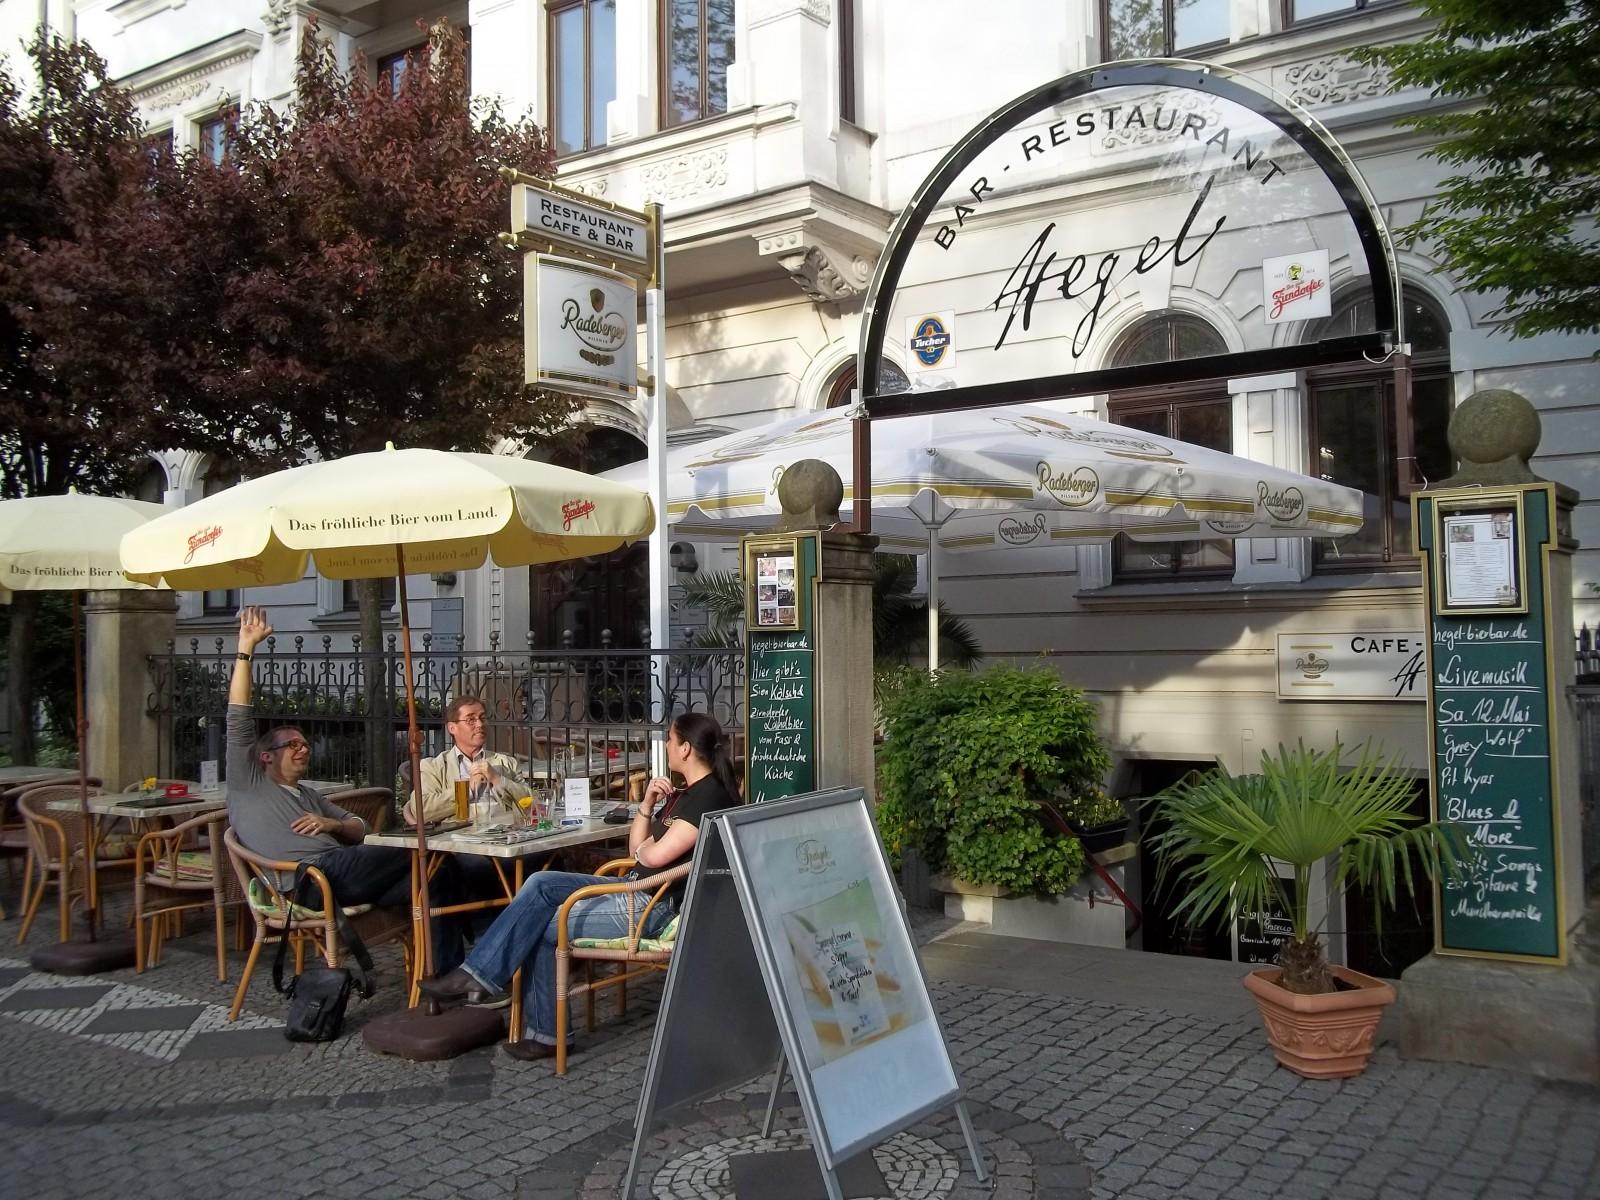 aposhegelapos bar restaurant in magdeburg. Black Bedroom Furniture Sets. Home Design Ideas